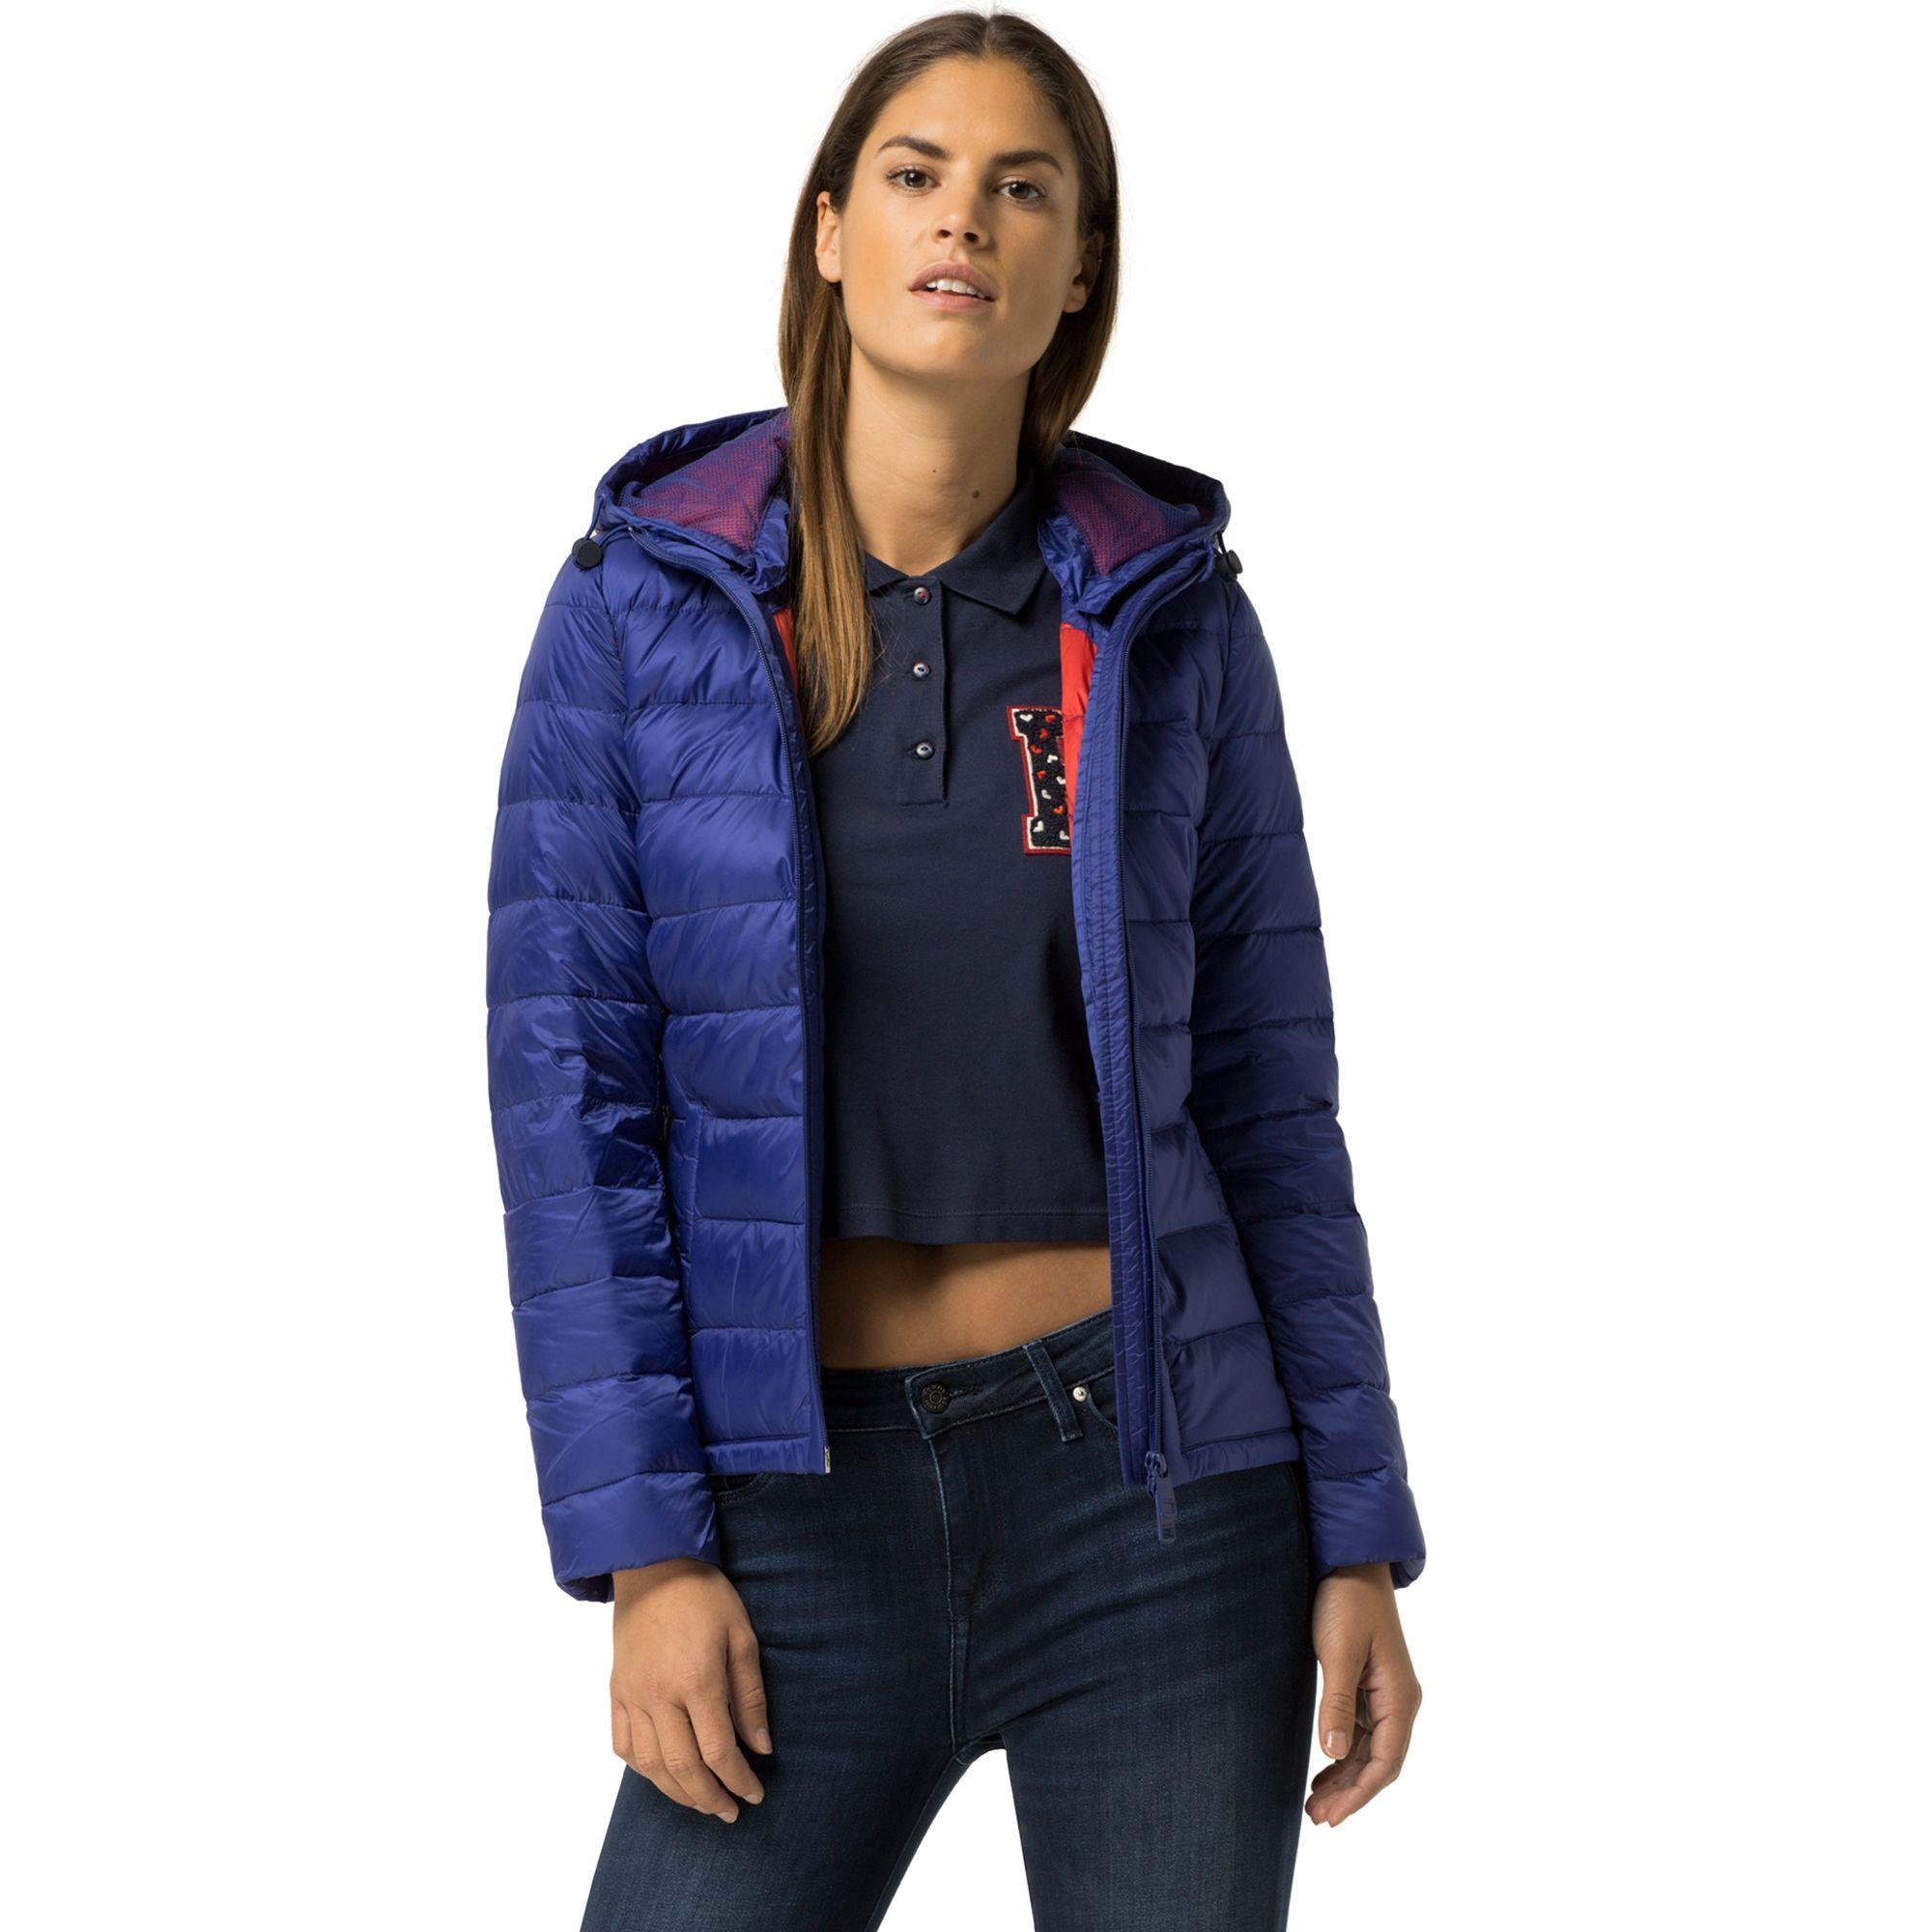 Tommy Hilfiger Final Sale Hooded Puffer Jacket Clematis Blue Tommyhilfiger Cloth Jackets Floral Bomber Jacket Clothes Design [ 2000 x 2000 Pixel ]